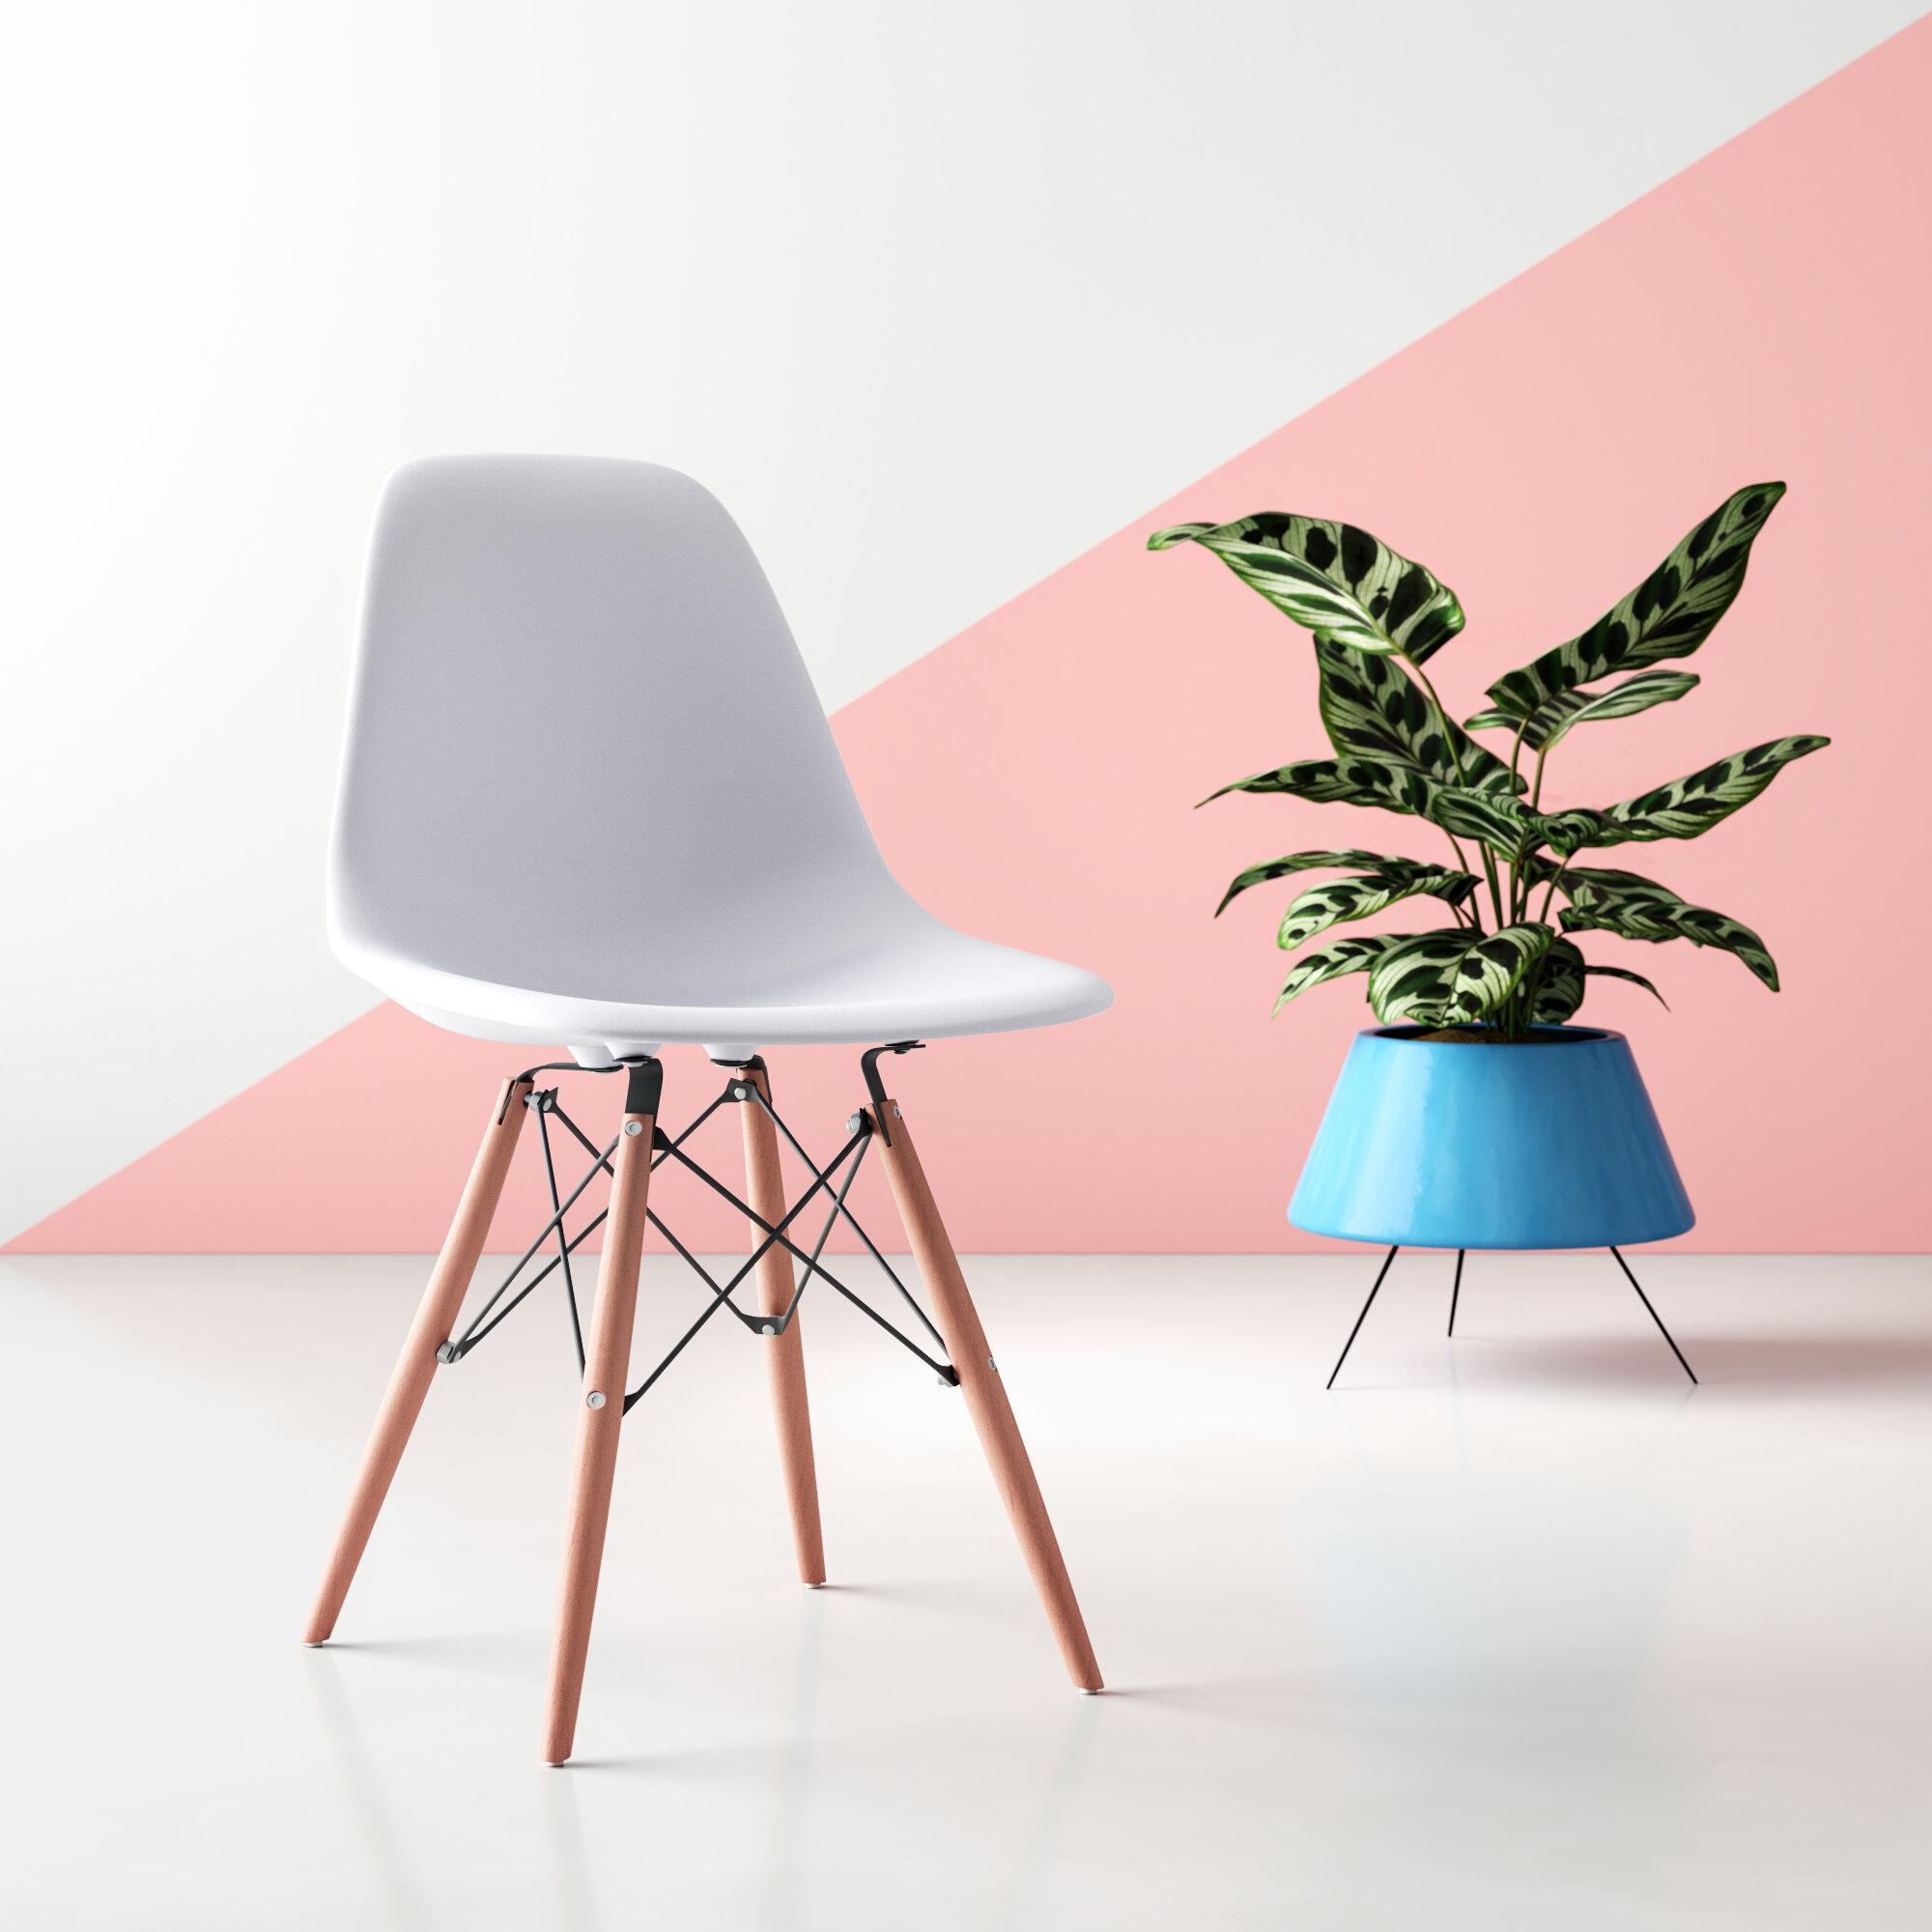 Swell Hashtag Home Wrenshall Social Mid Century Side Chair Short Links Chair Design For Home Short Linksinfo